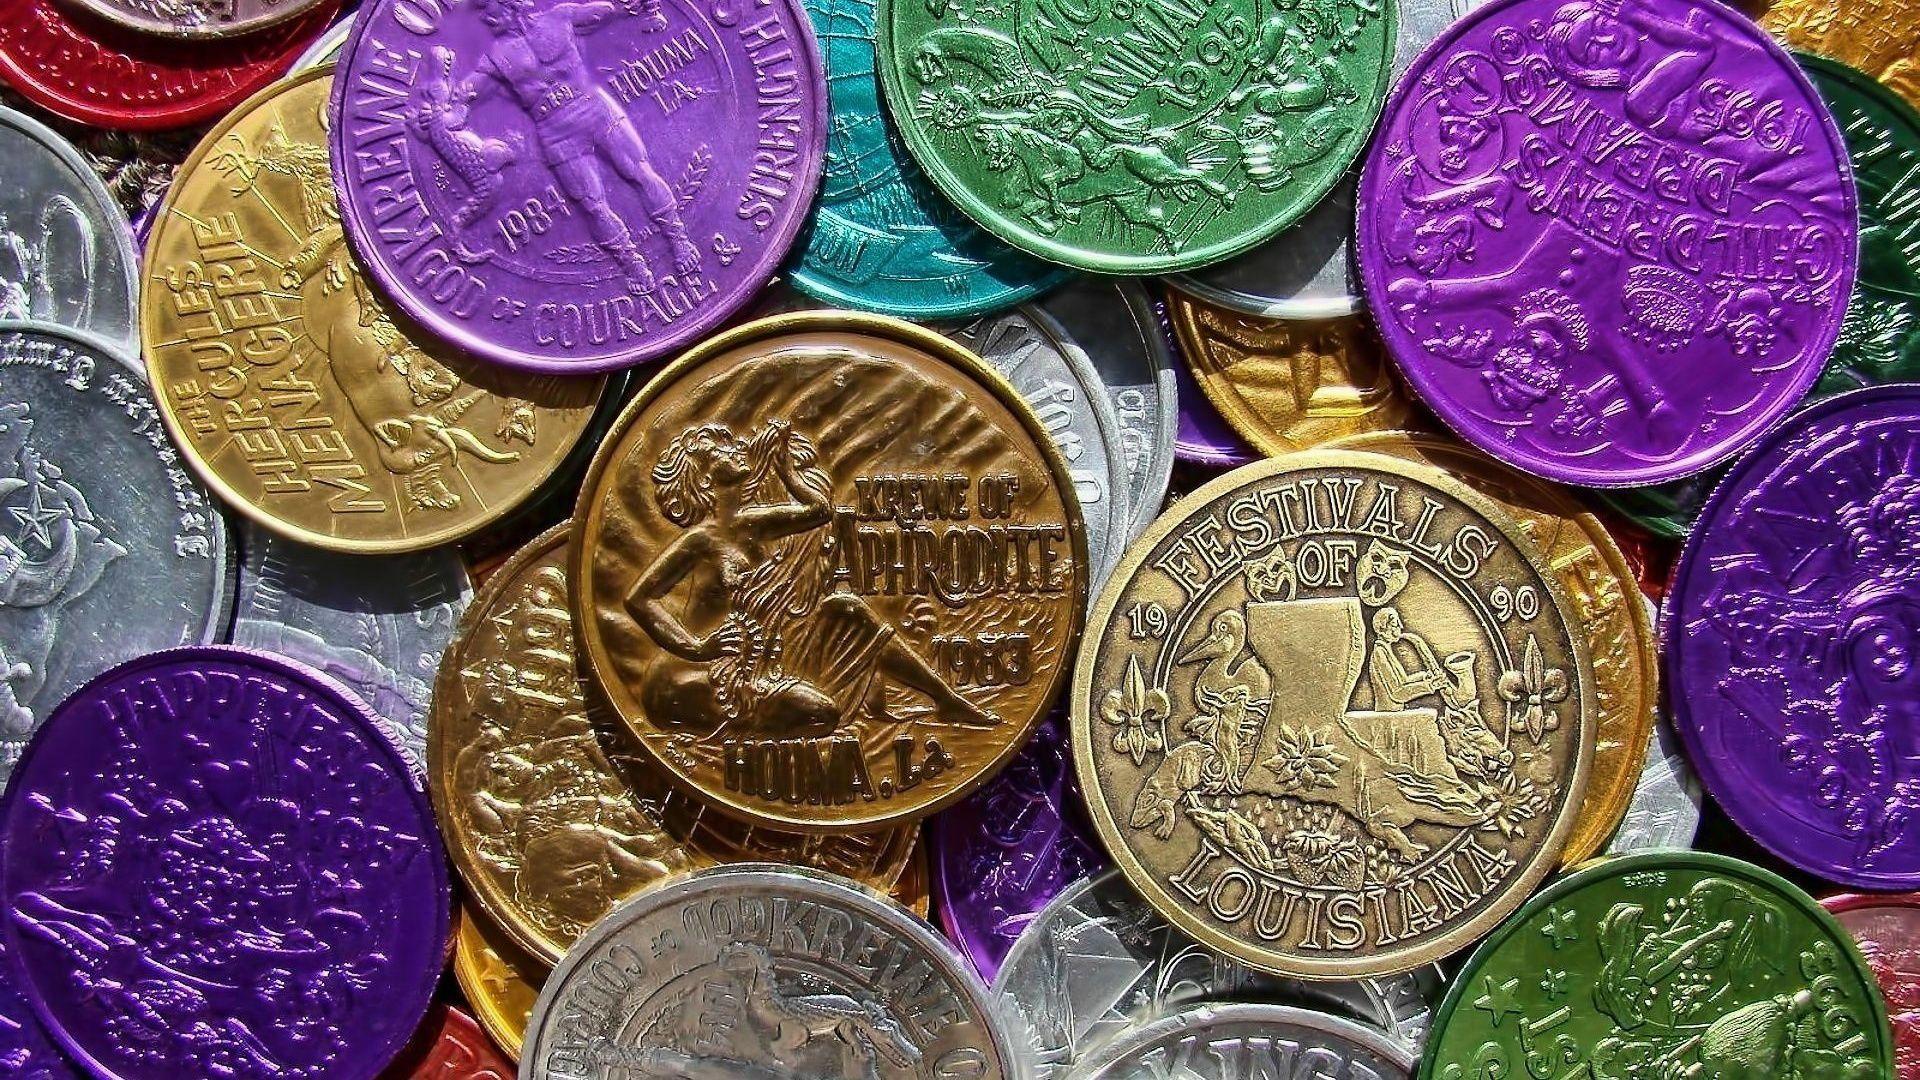 beautiful-money-wallpaper_090605496_192-money